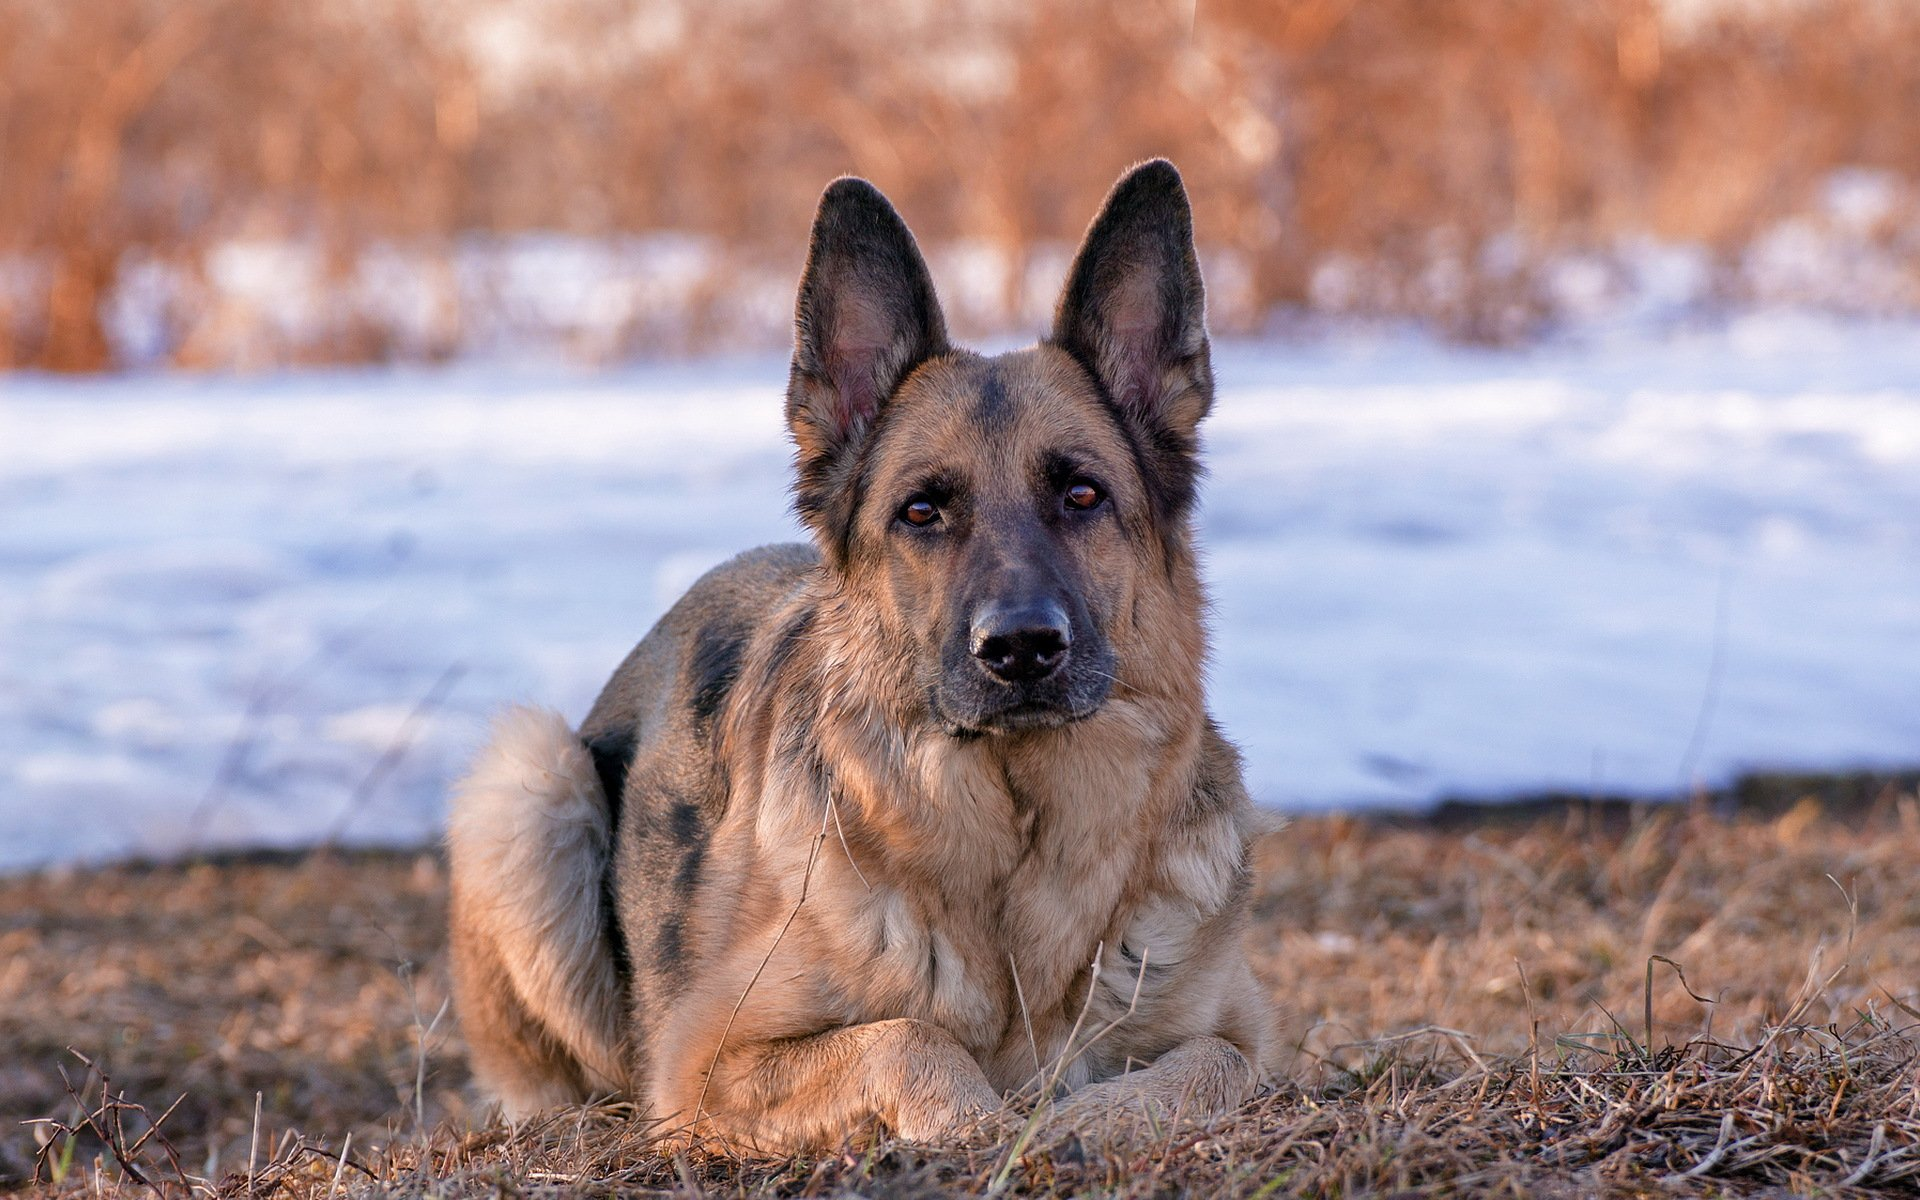 природа животные собака немецка овчарка nature animals dog the German shepherd  № 1004472 без смс